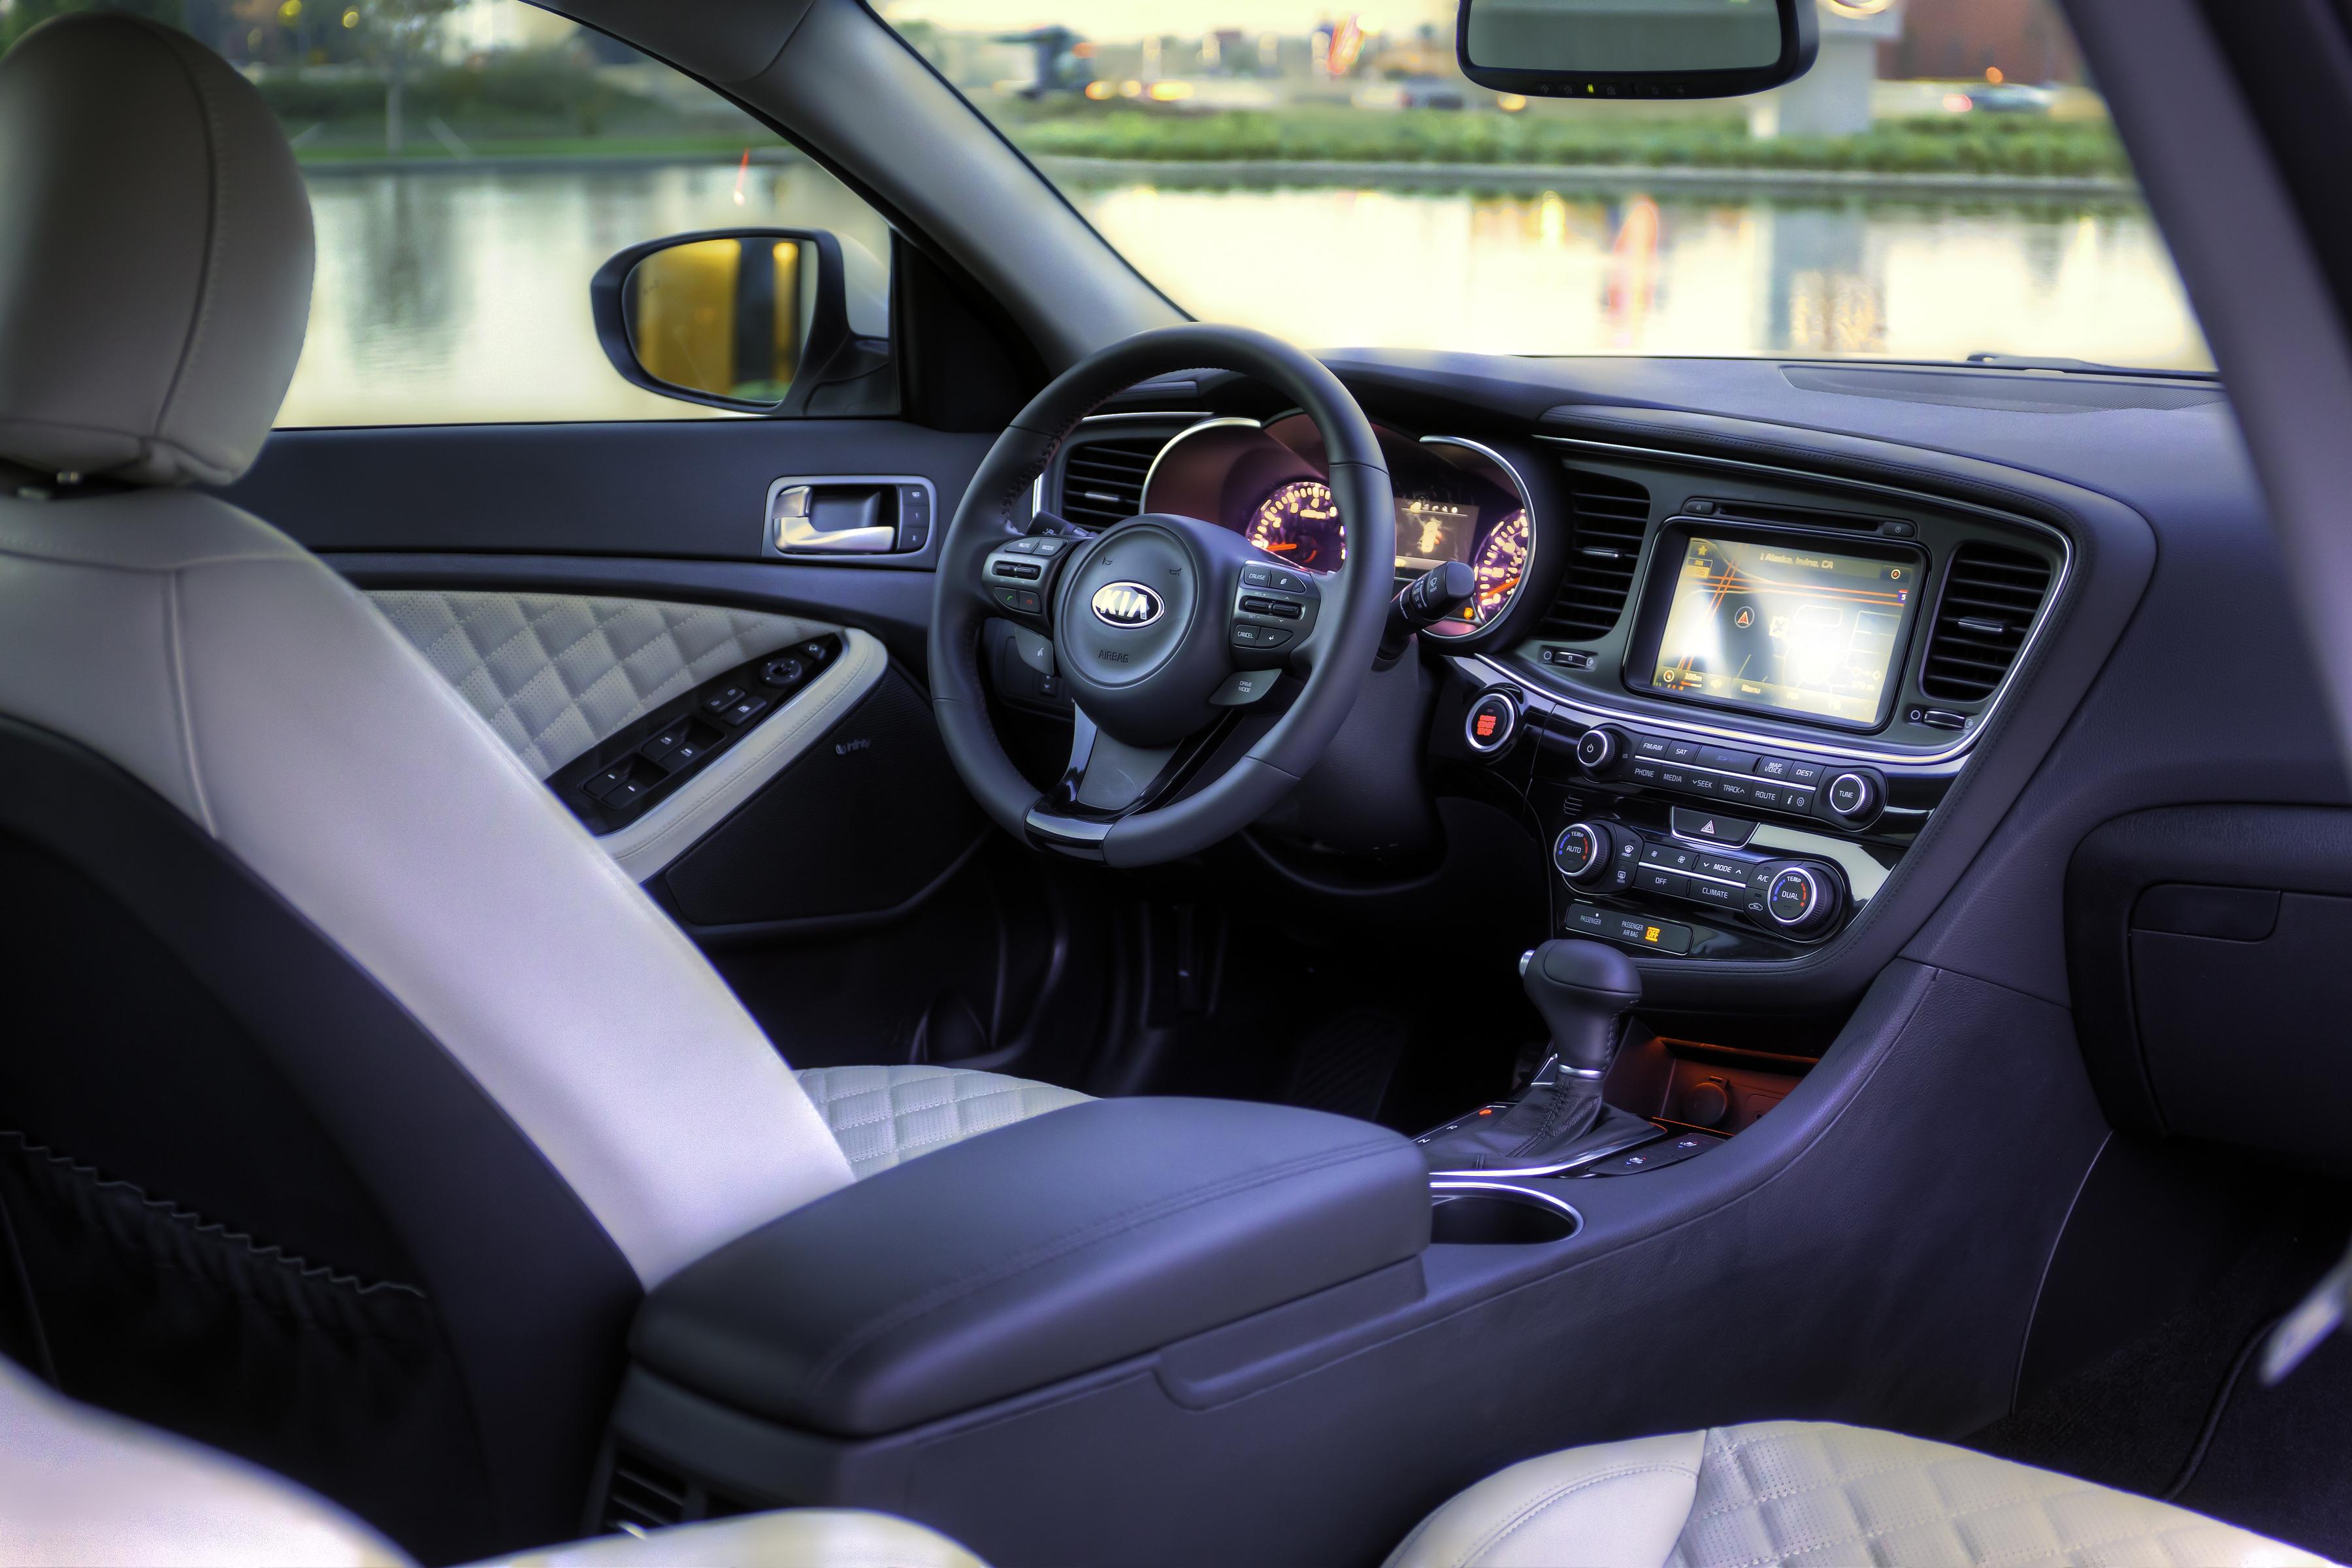 interior cars kia motor reviews trend rating view optima and